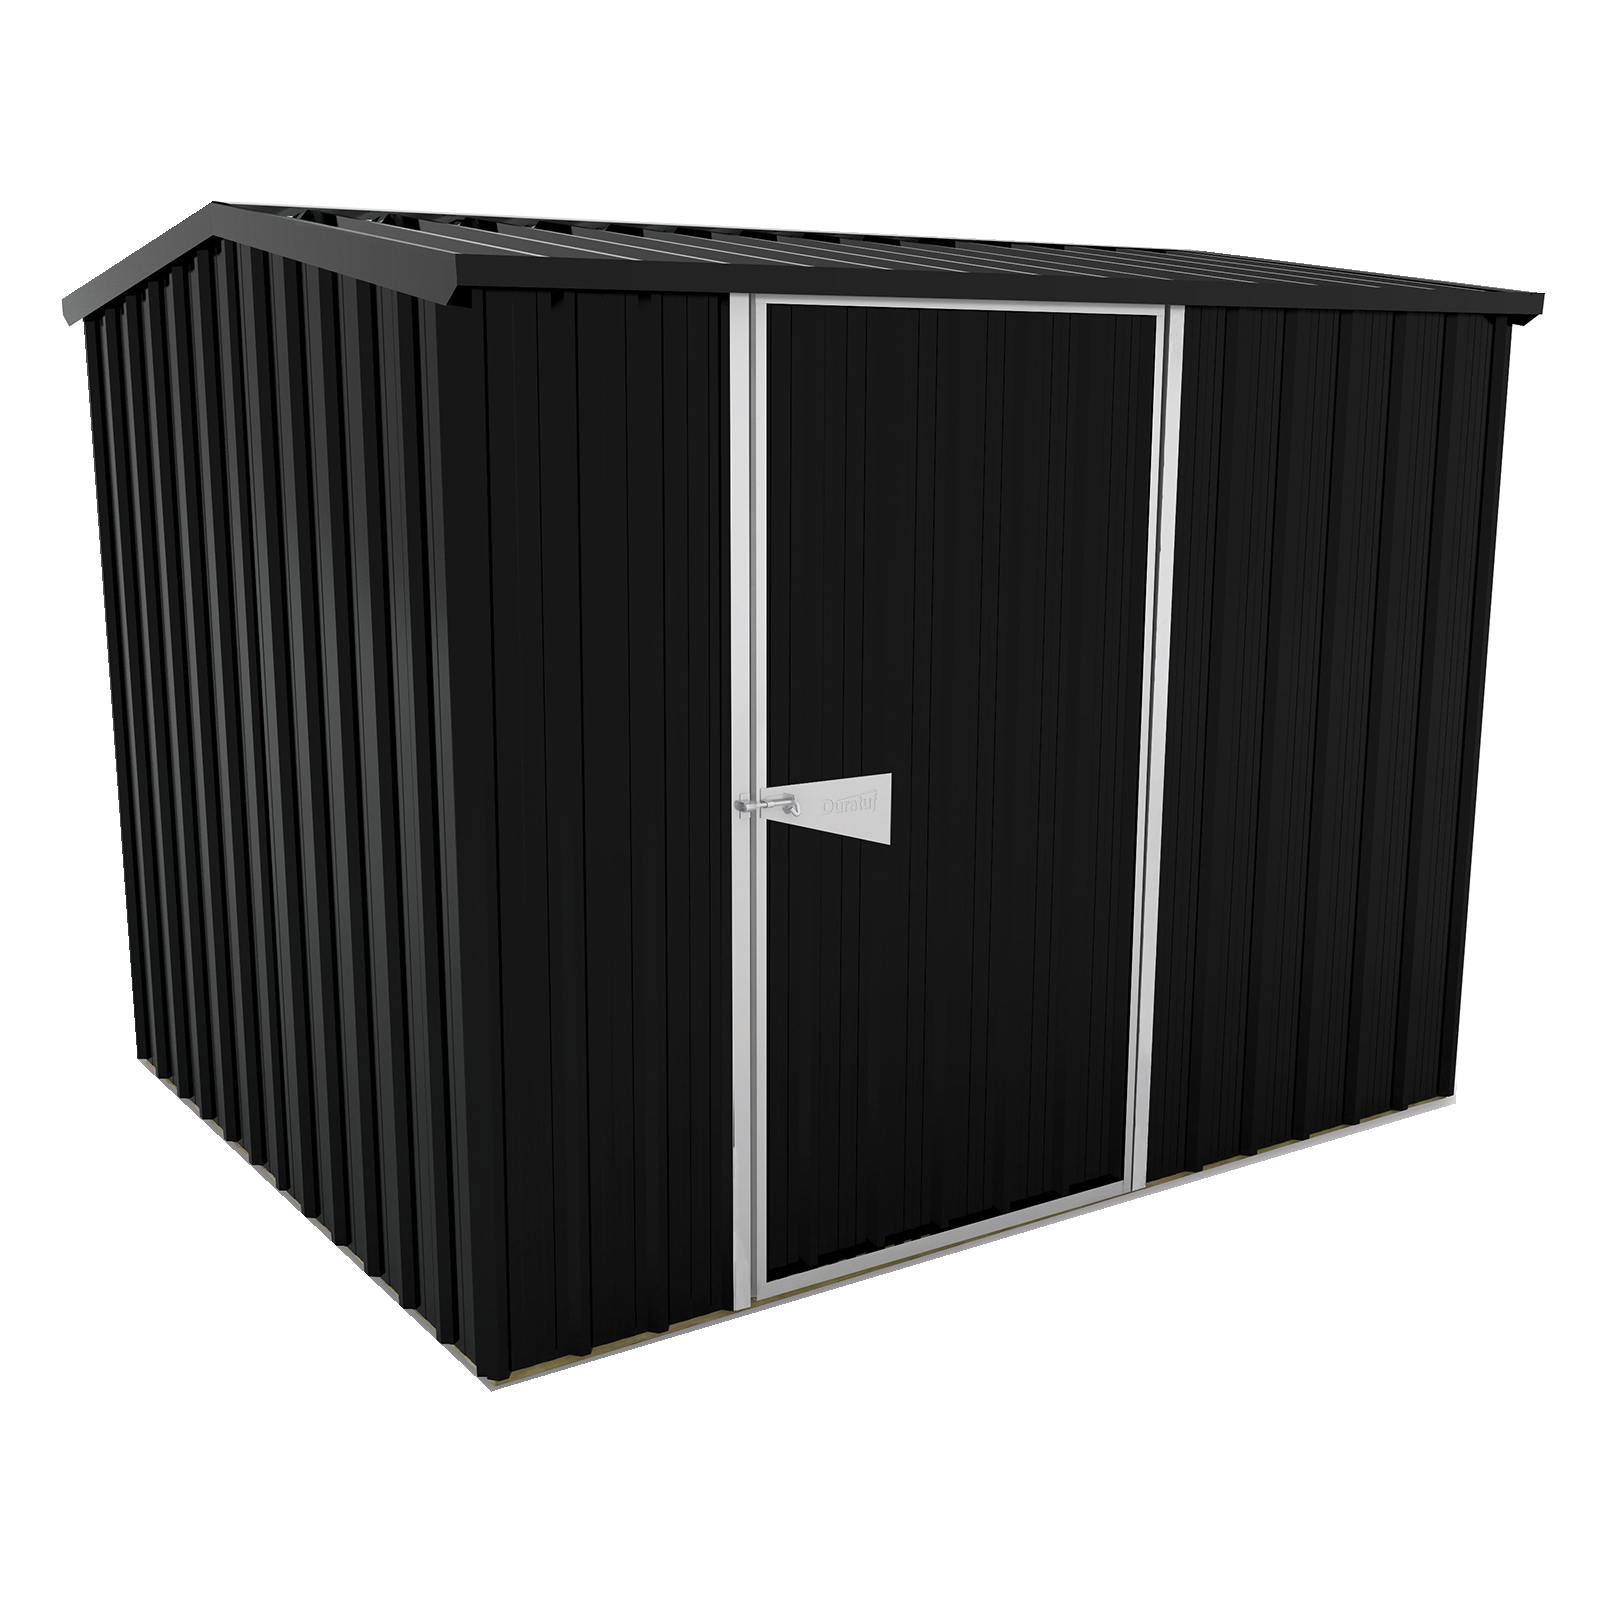 Duratuf Sentry 2.5 x 2.0m Ebony Gable Shed